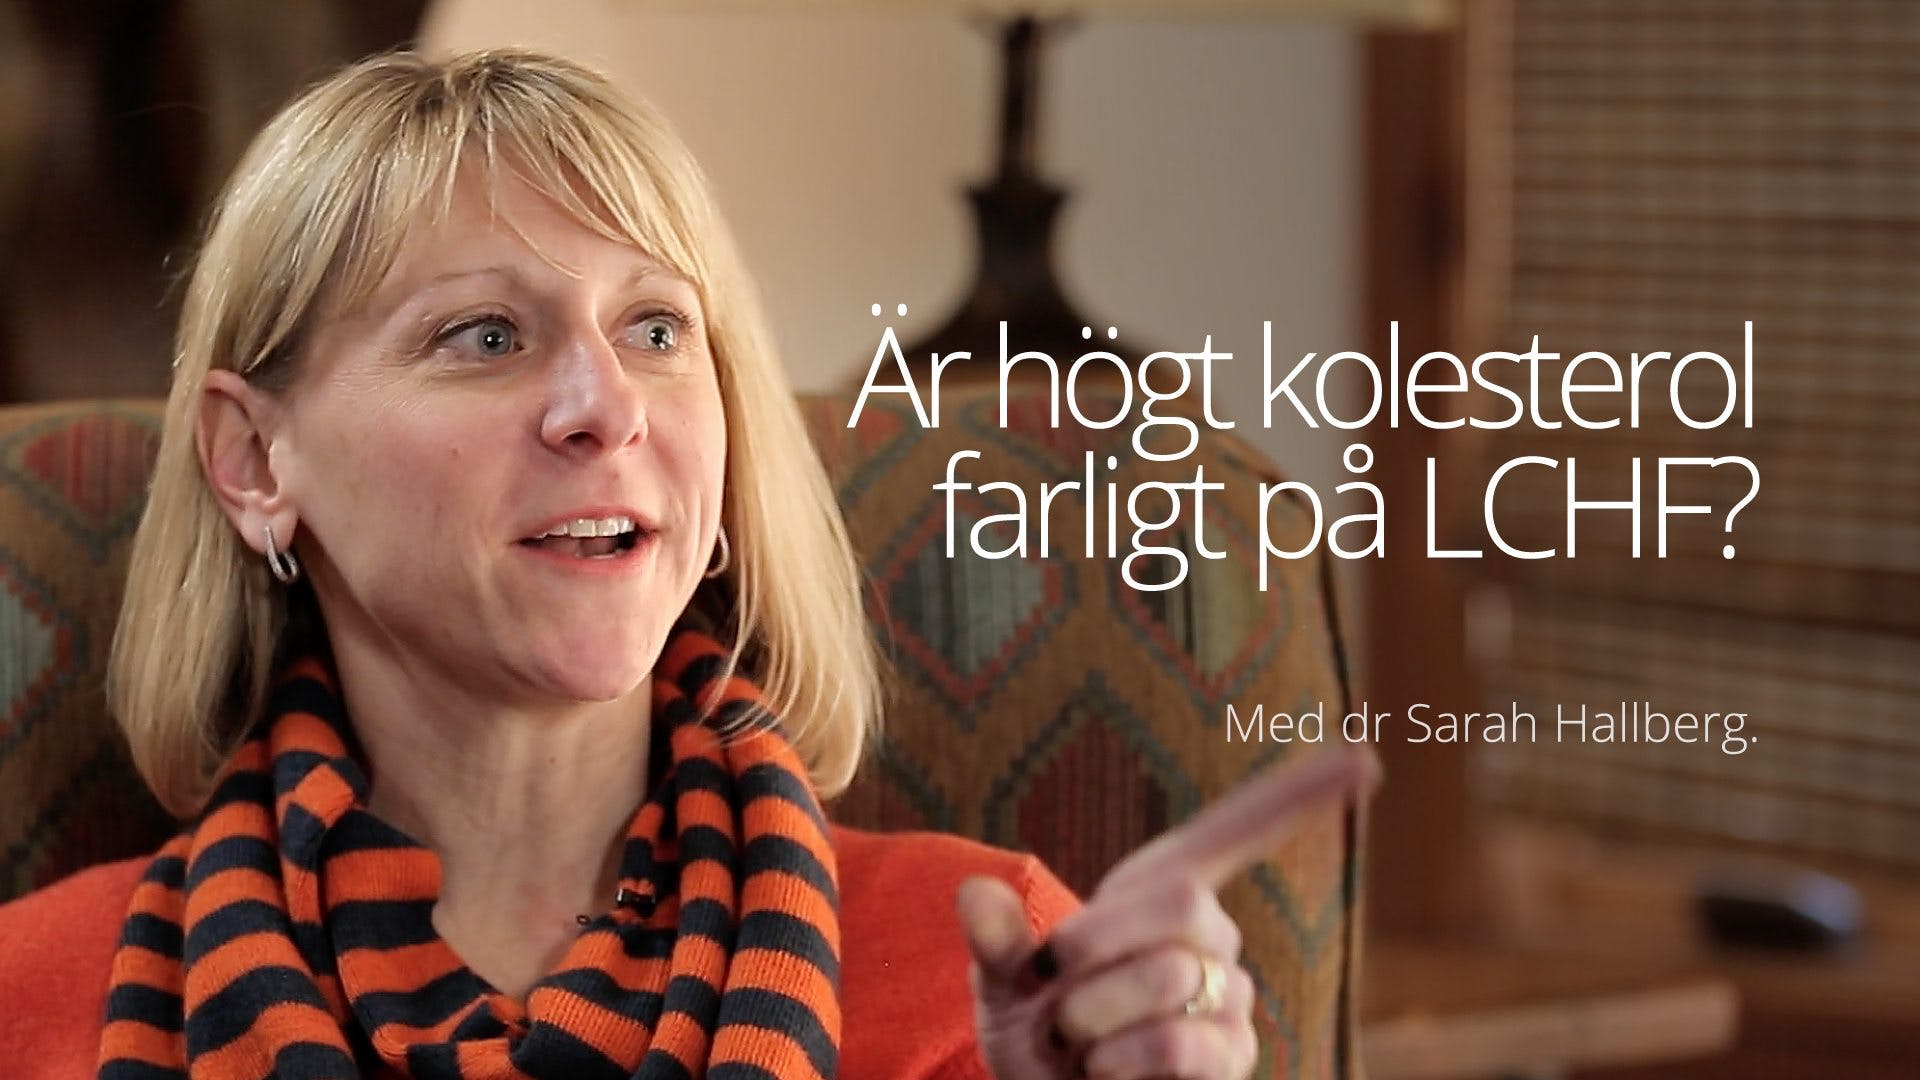 Interview 2 - Sarah Hallberg (Vail 2016)